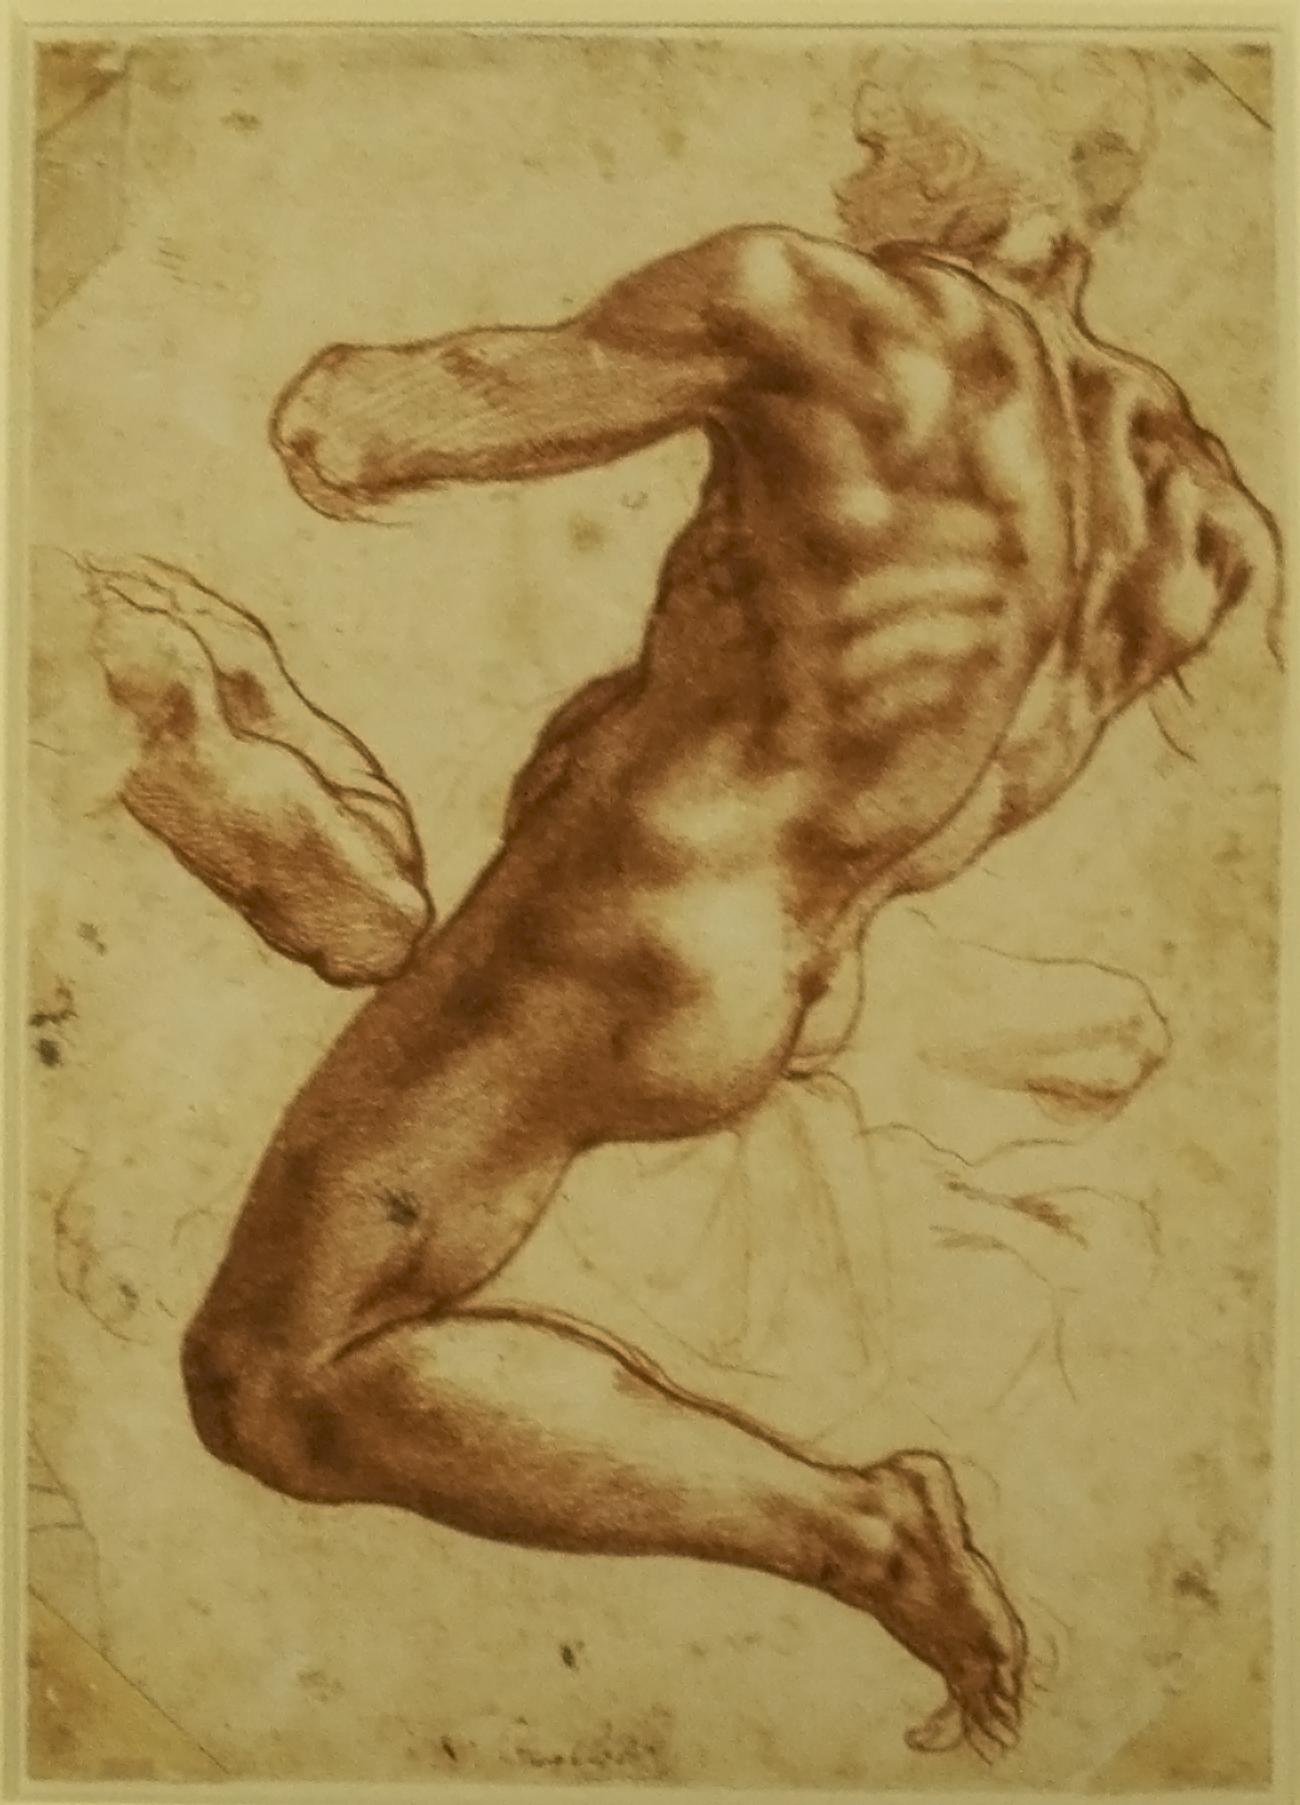 File:Michelangelo - Study of an Ignudo.jpg - Wikimedia Commons